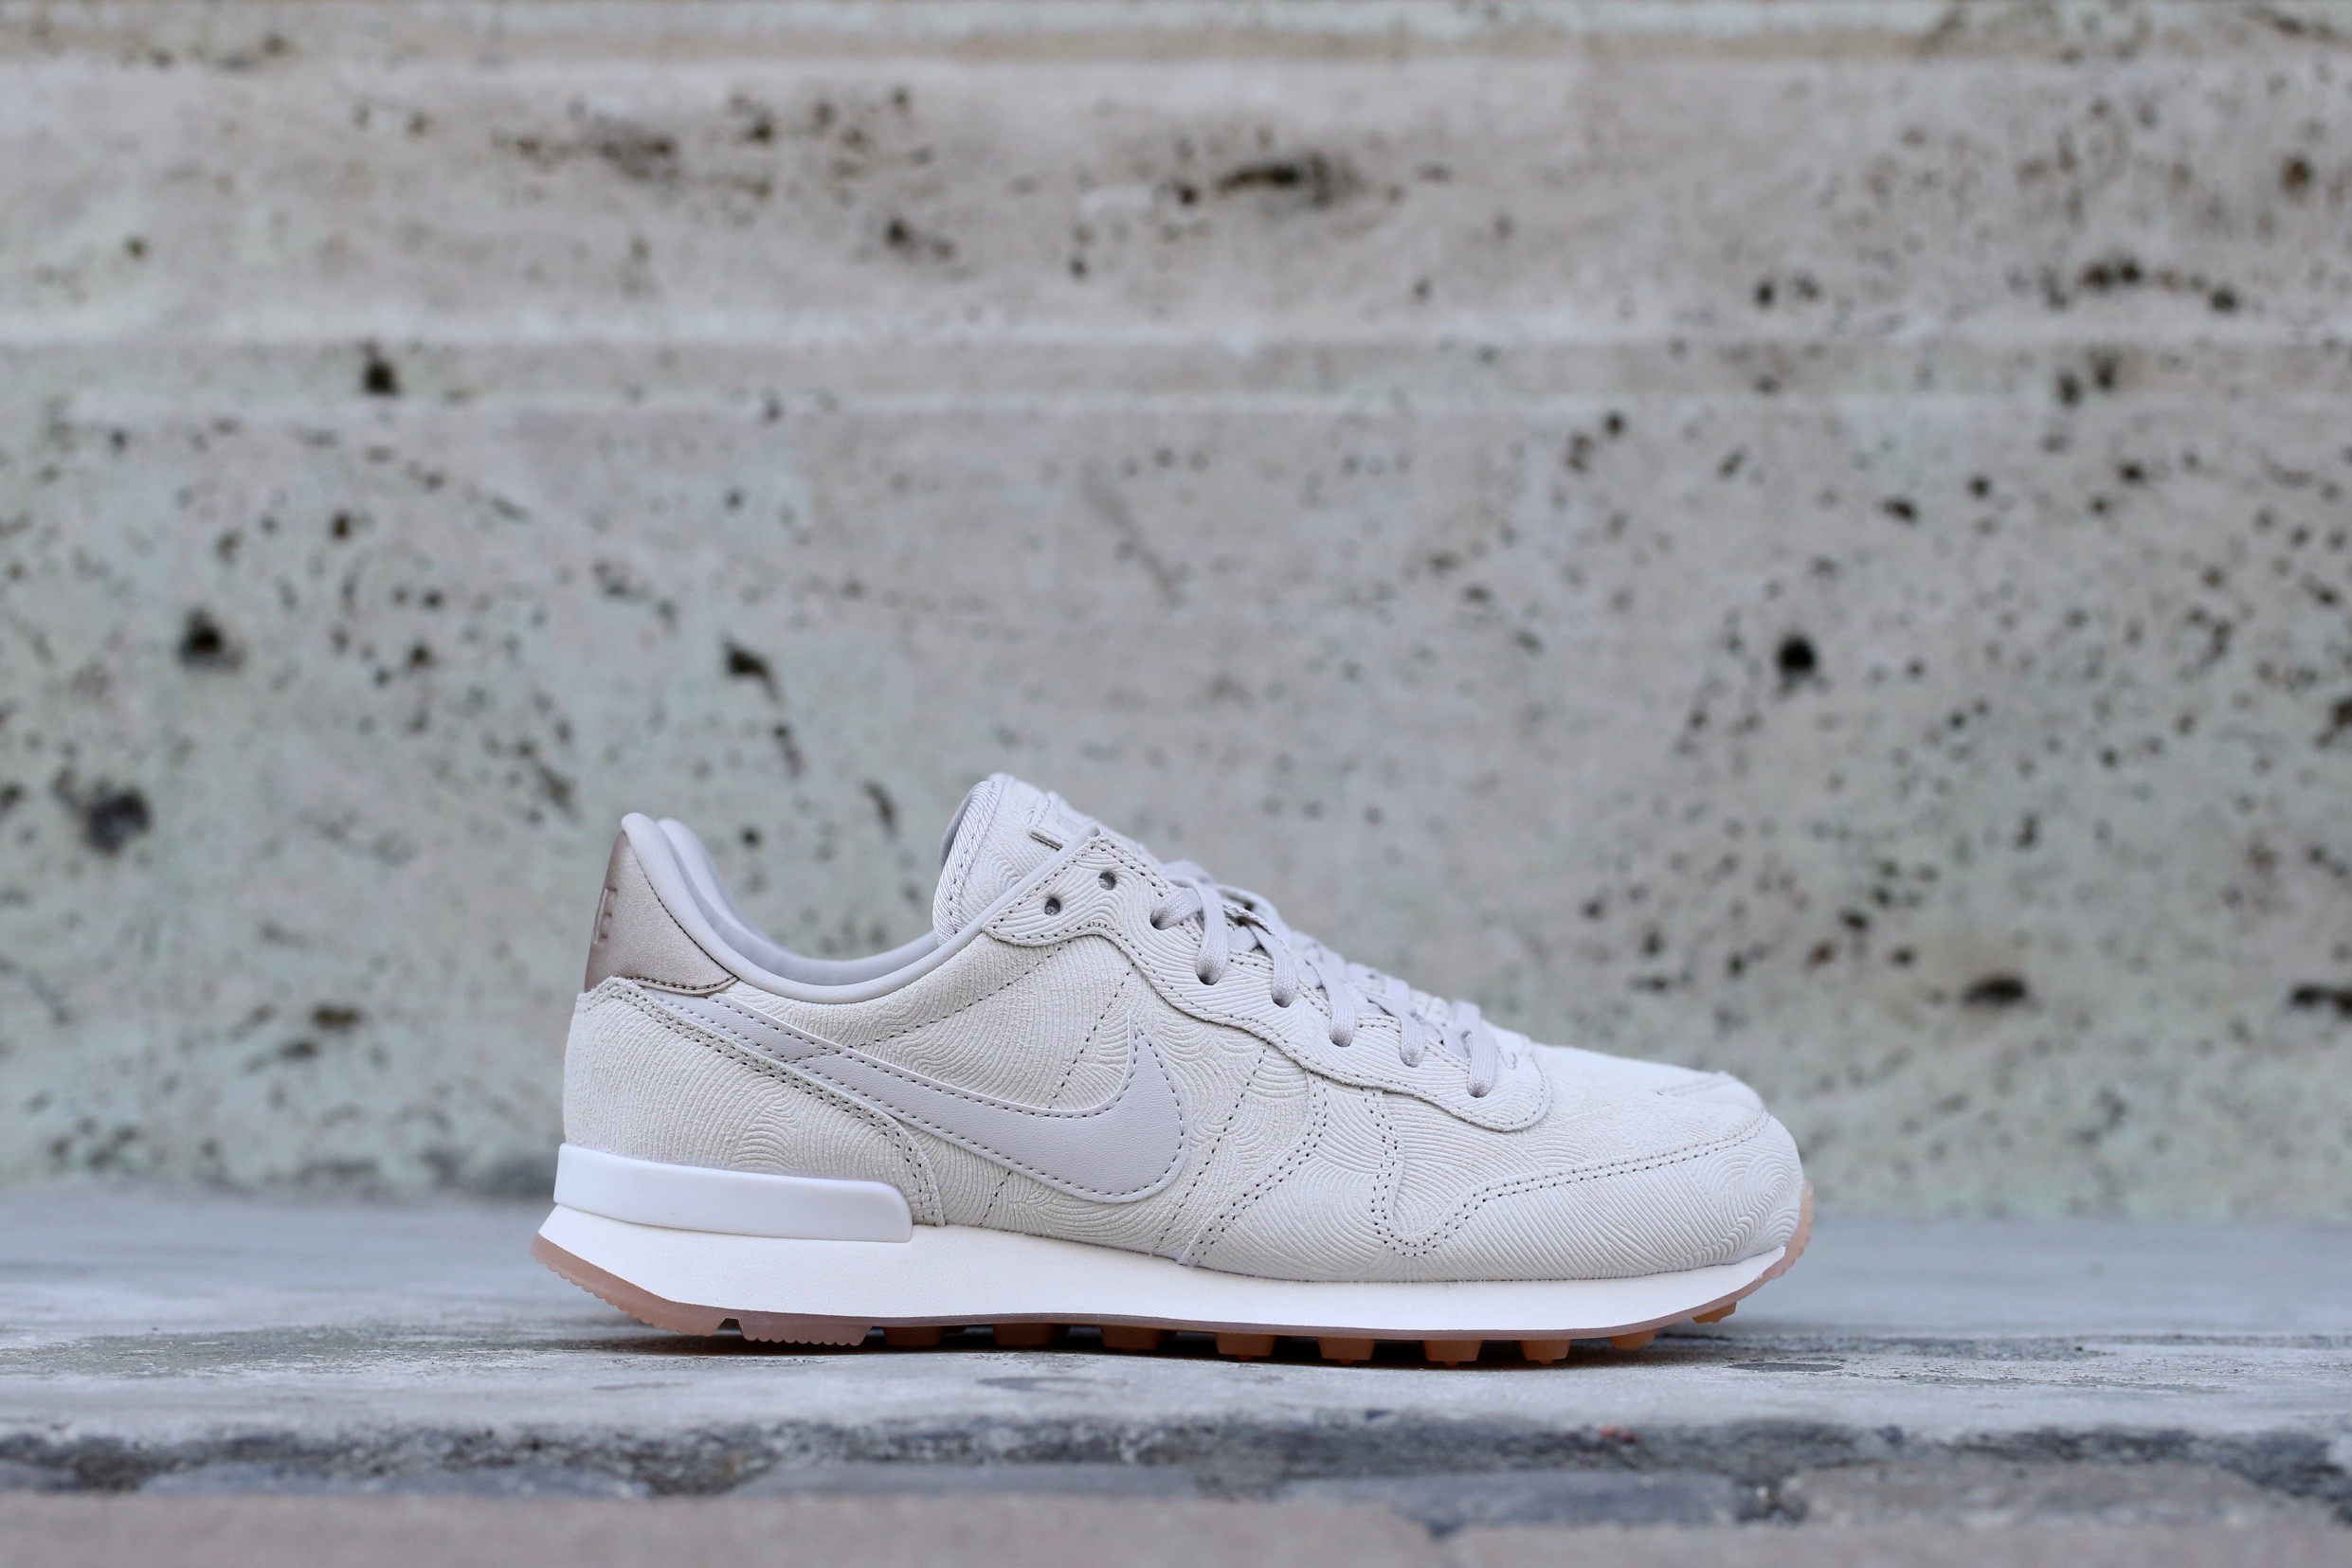 new style be6c8 dd3d2 Nike Wmns Internationalist PRM – Gamma Grey   Phantom   Gum Yellow ...